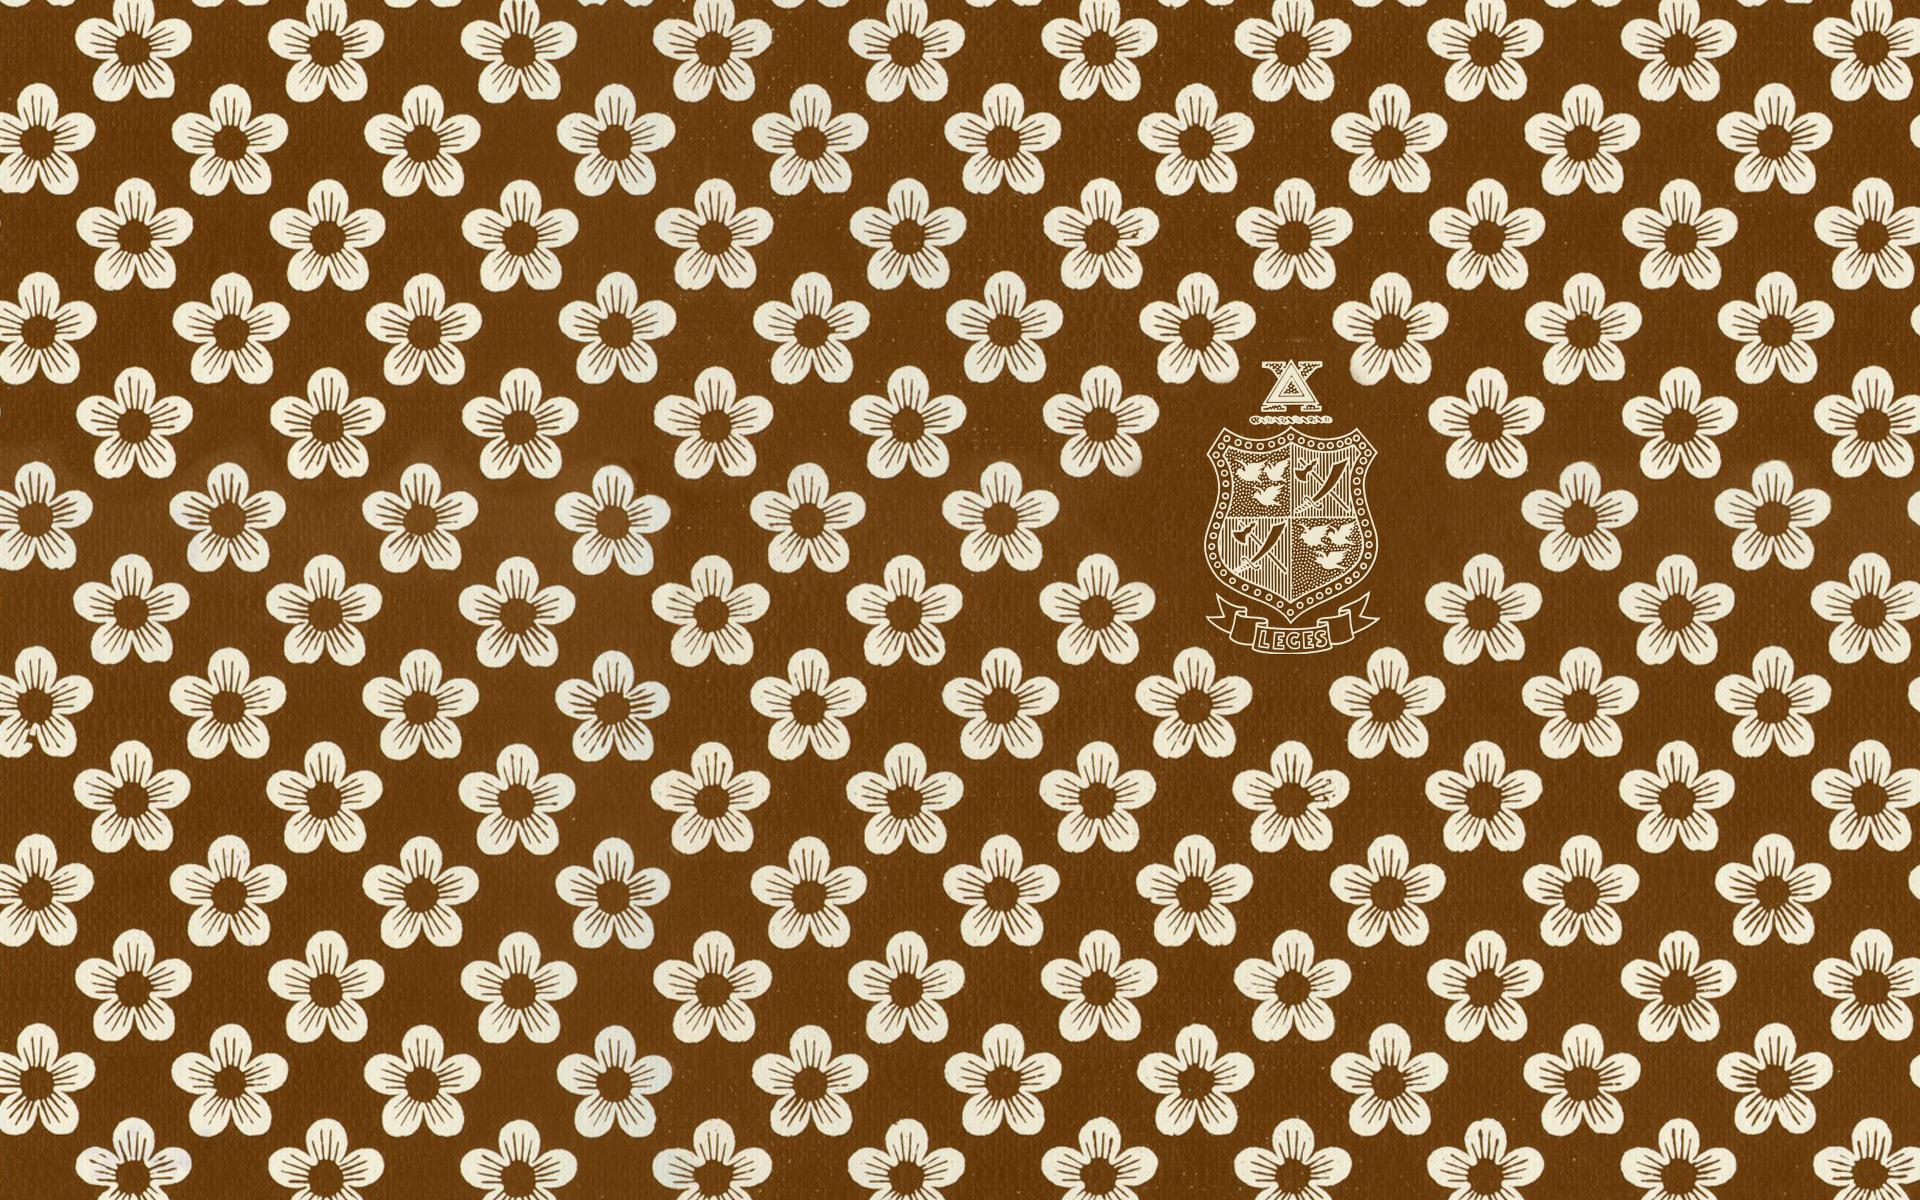 20S Texture HD wallpaper